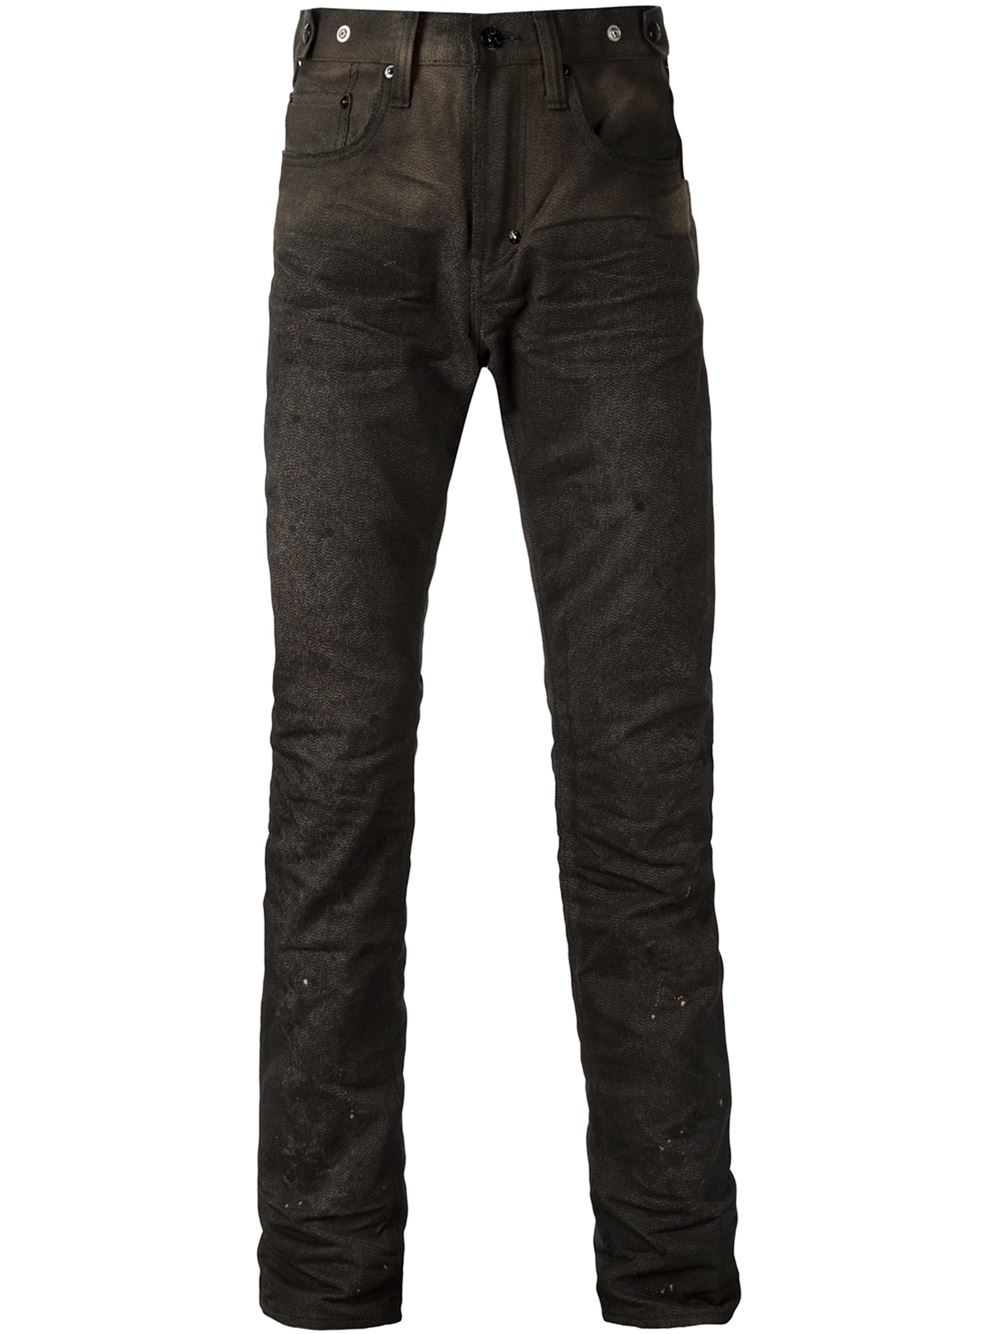 a3428442c7d Lyst - PRPS  demon Etamin  Jeans in Black for Men